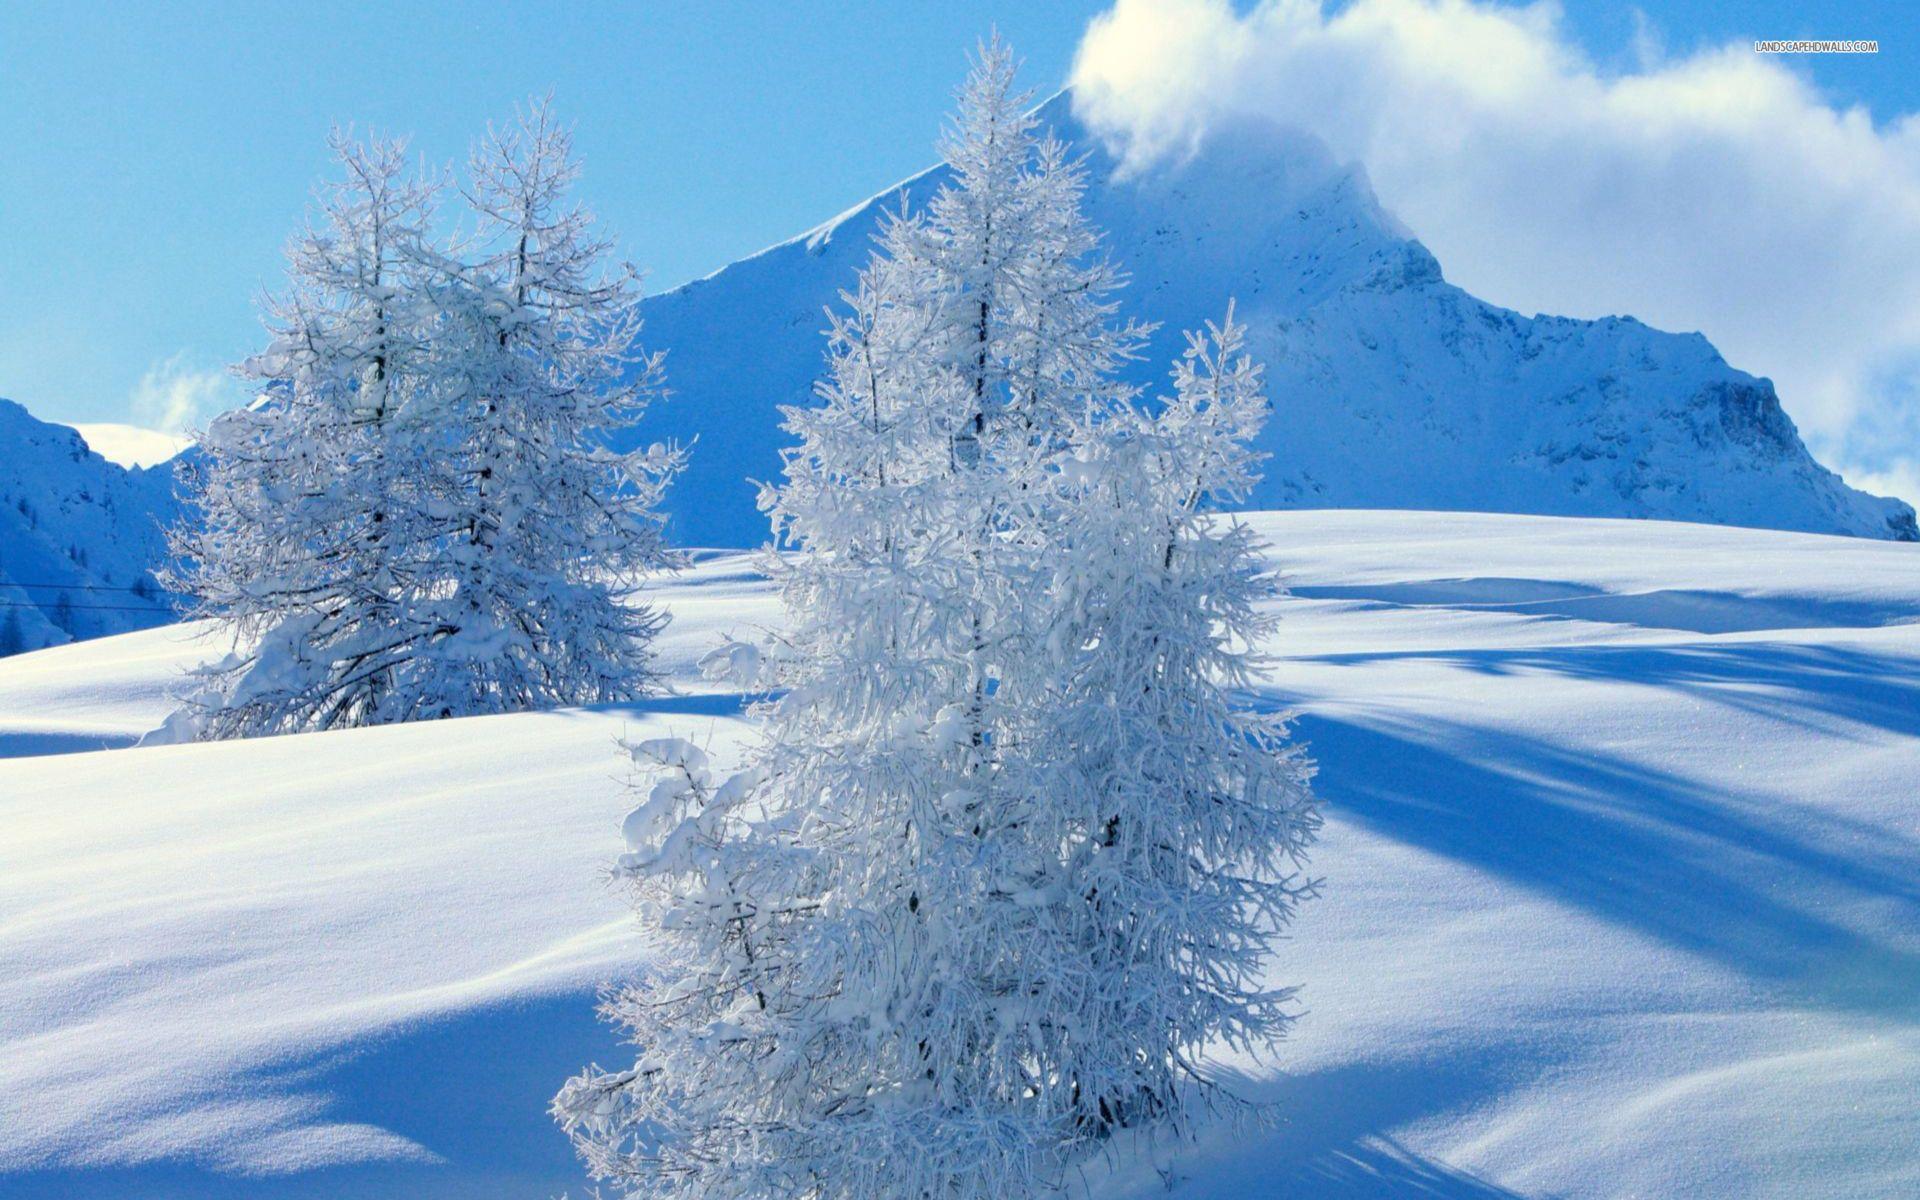 Fantastic Wallpaper High Quality Winter - 9e13ec5549dd8221d2406cae9d55e3c5  Trends_15281.jpg